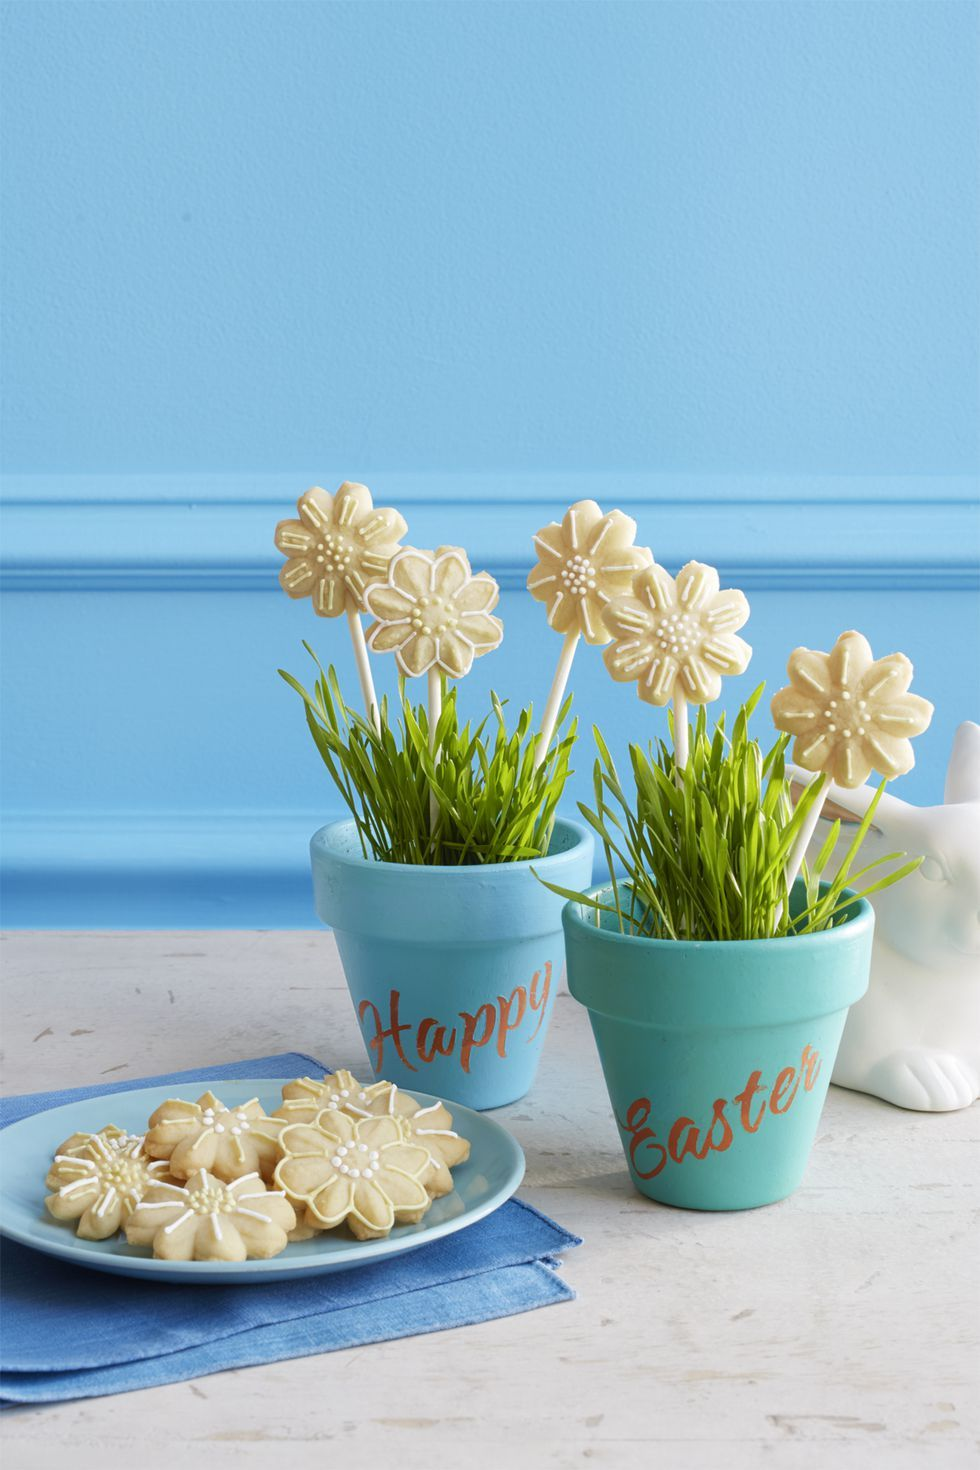 daisy spritz cookies